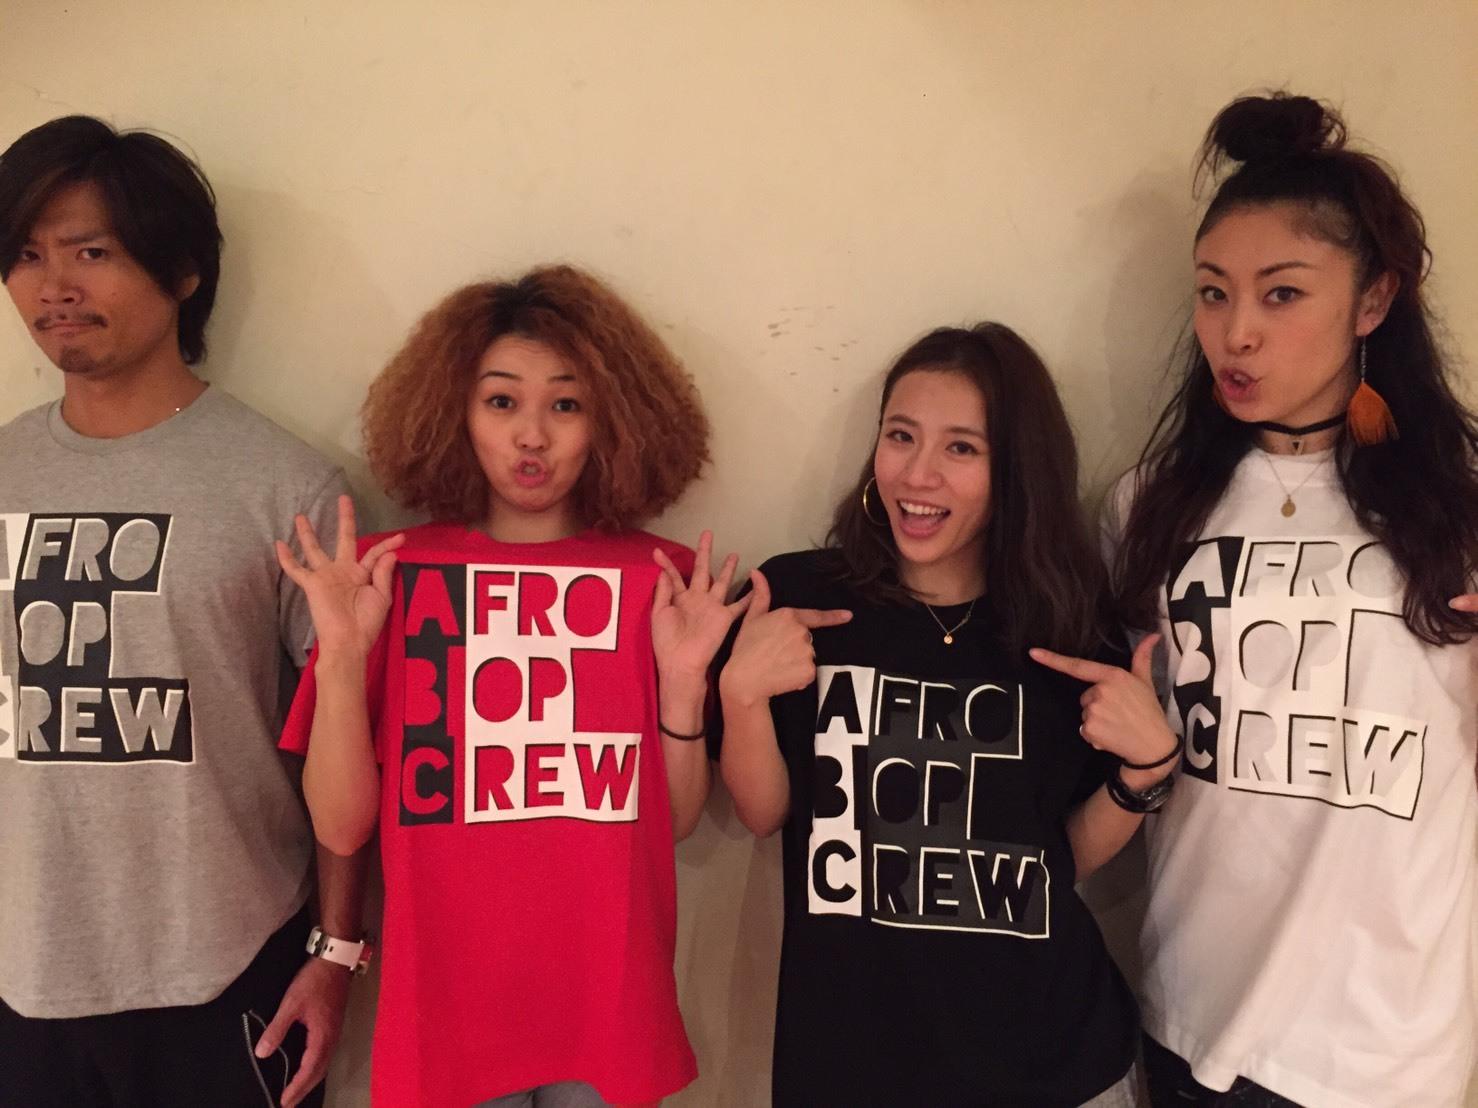 Afro Bop Crew Goods-1